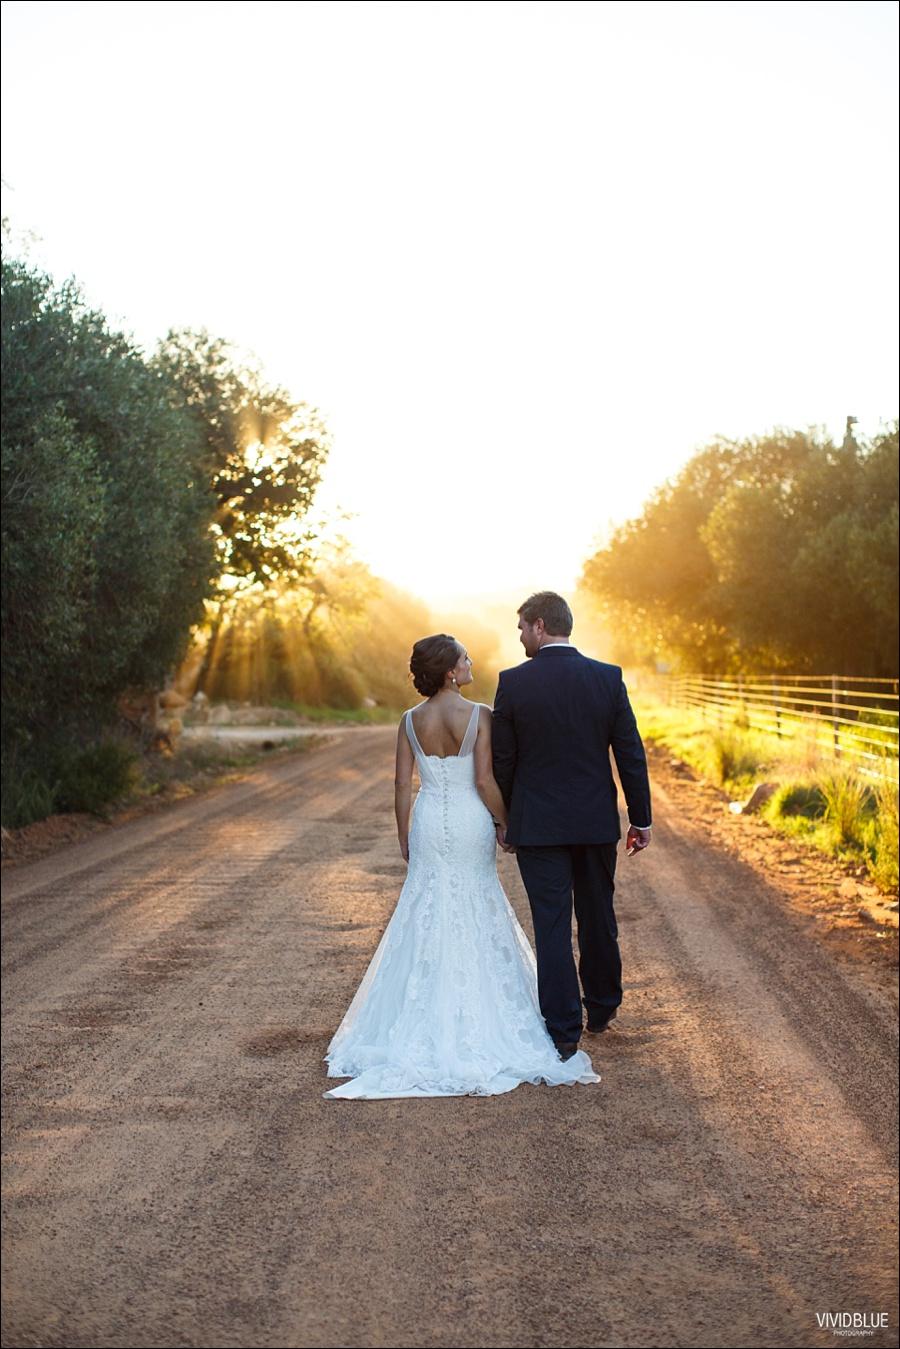 VividBlue-philip-anlika-kleinevalleij-wedding090